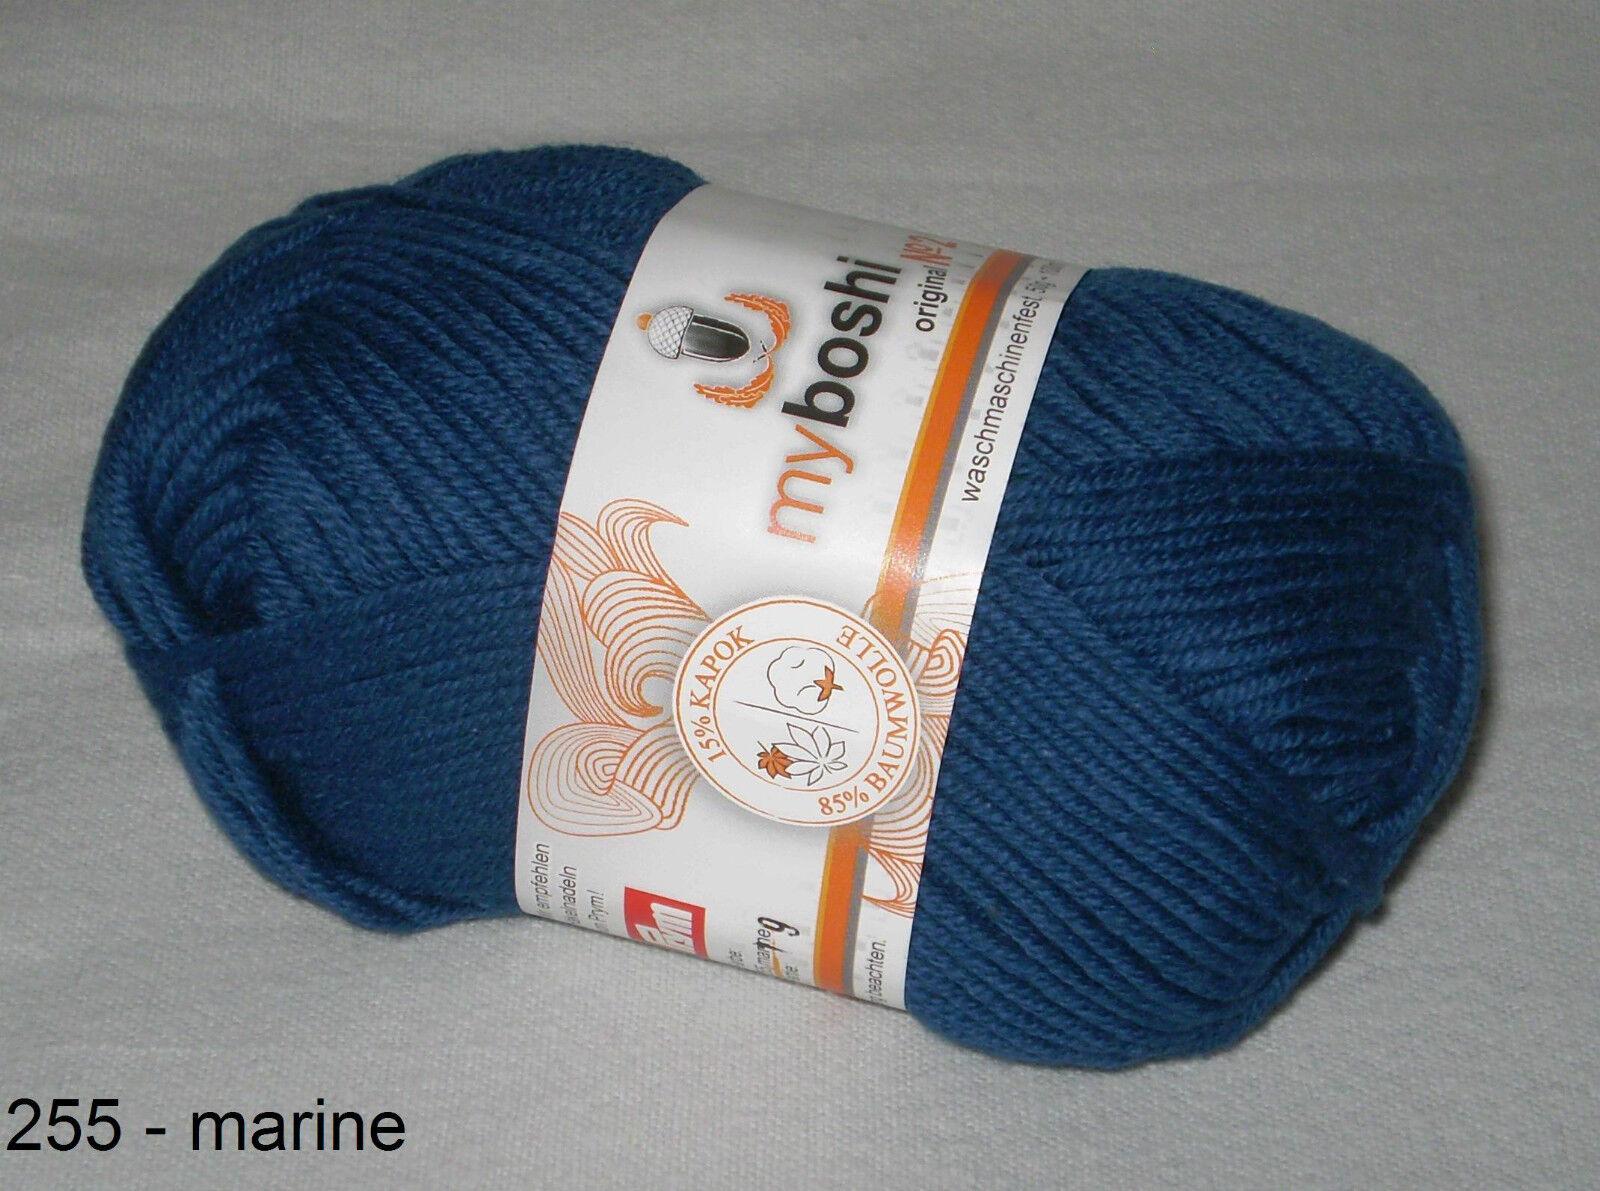 4,40 €100gr) 50 gr lana myboshi No 2 L' estate filato